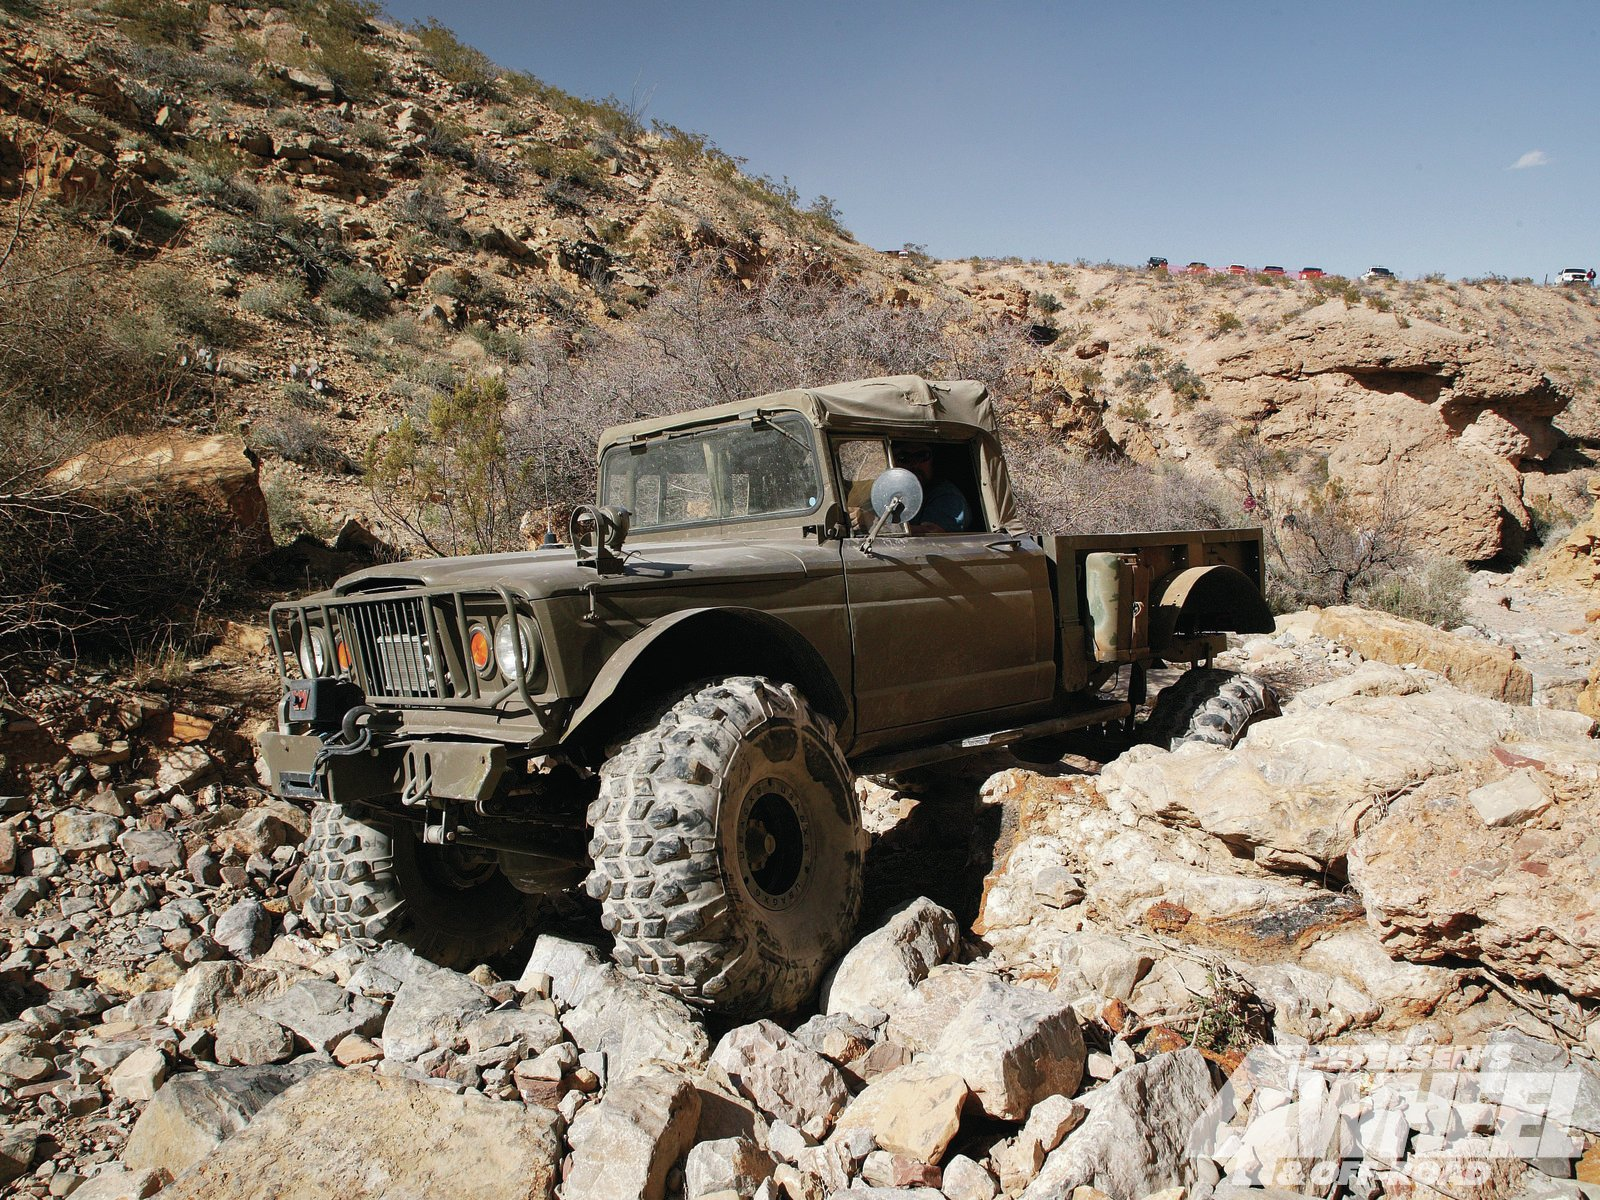 Thumb on Kaiser Military Vehicles